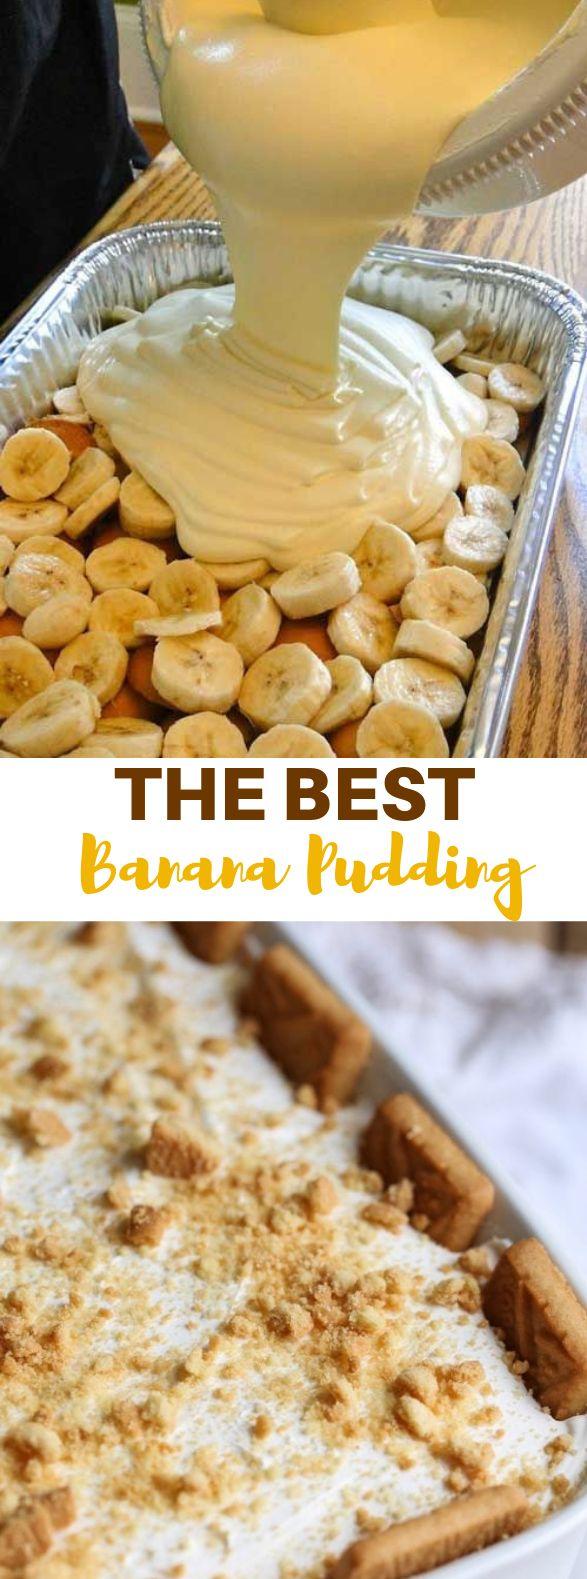 The Best Banana Pudding Ever #Banana #Sweet